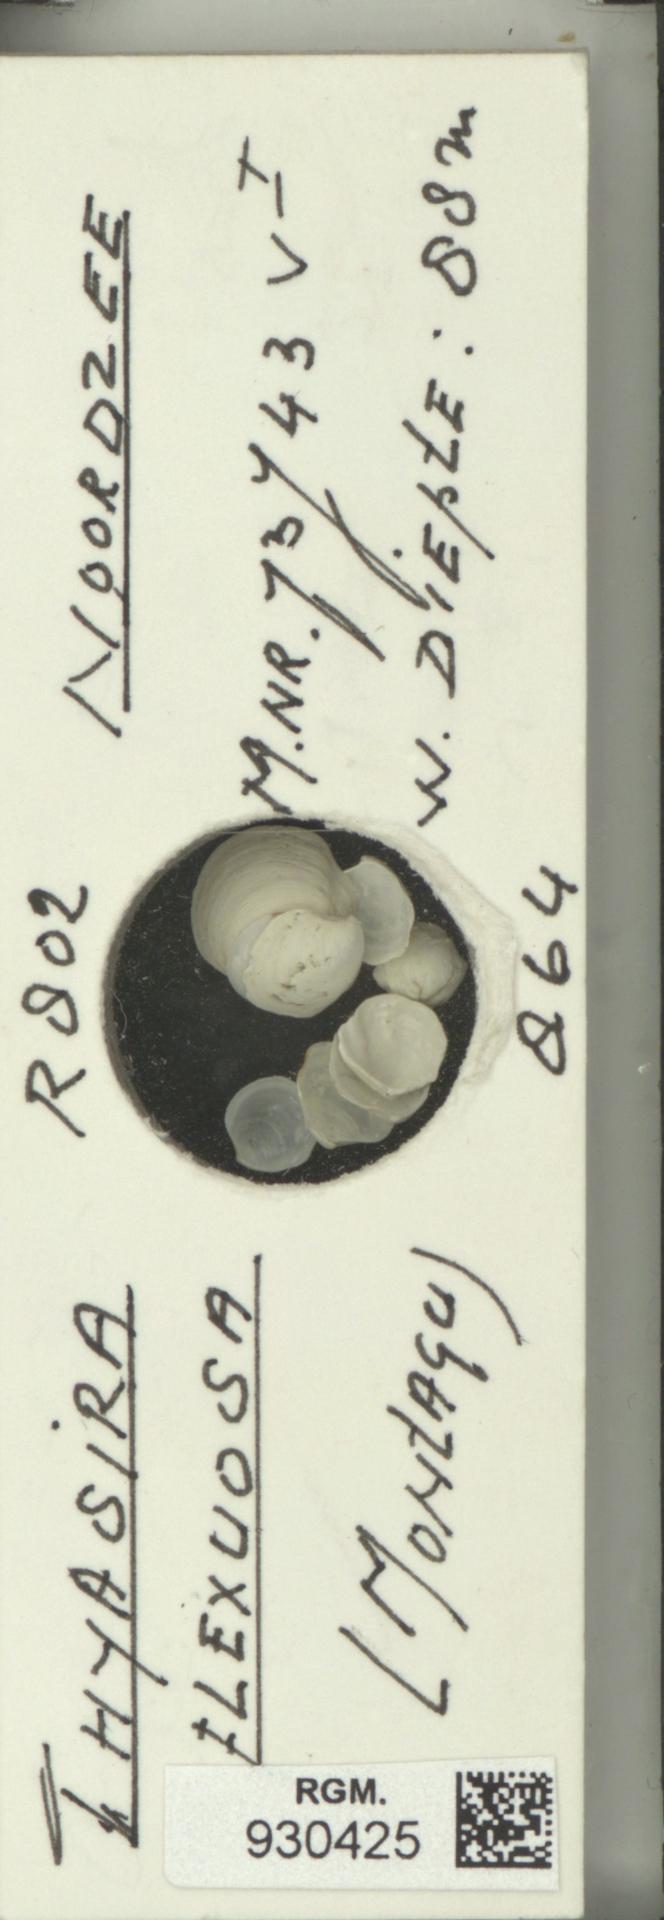 RGM.930425 | Thyasira flexuosa Montagu